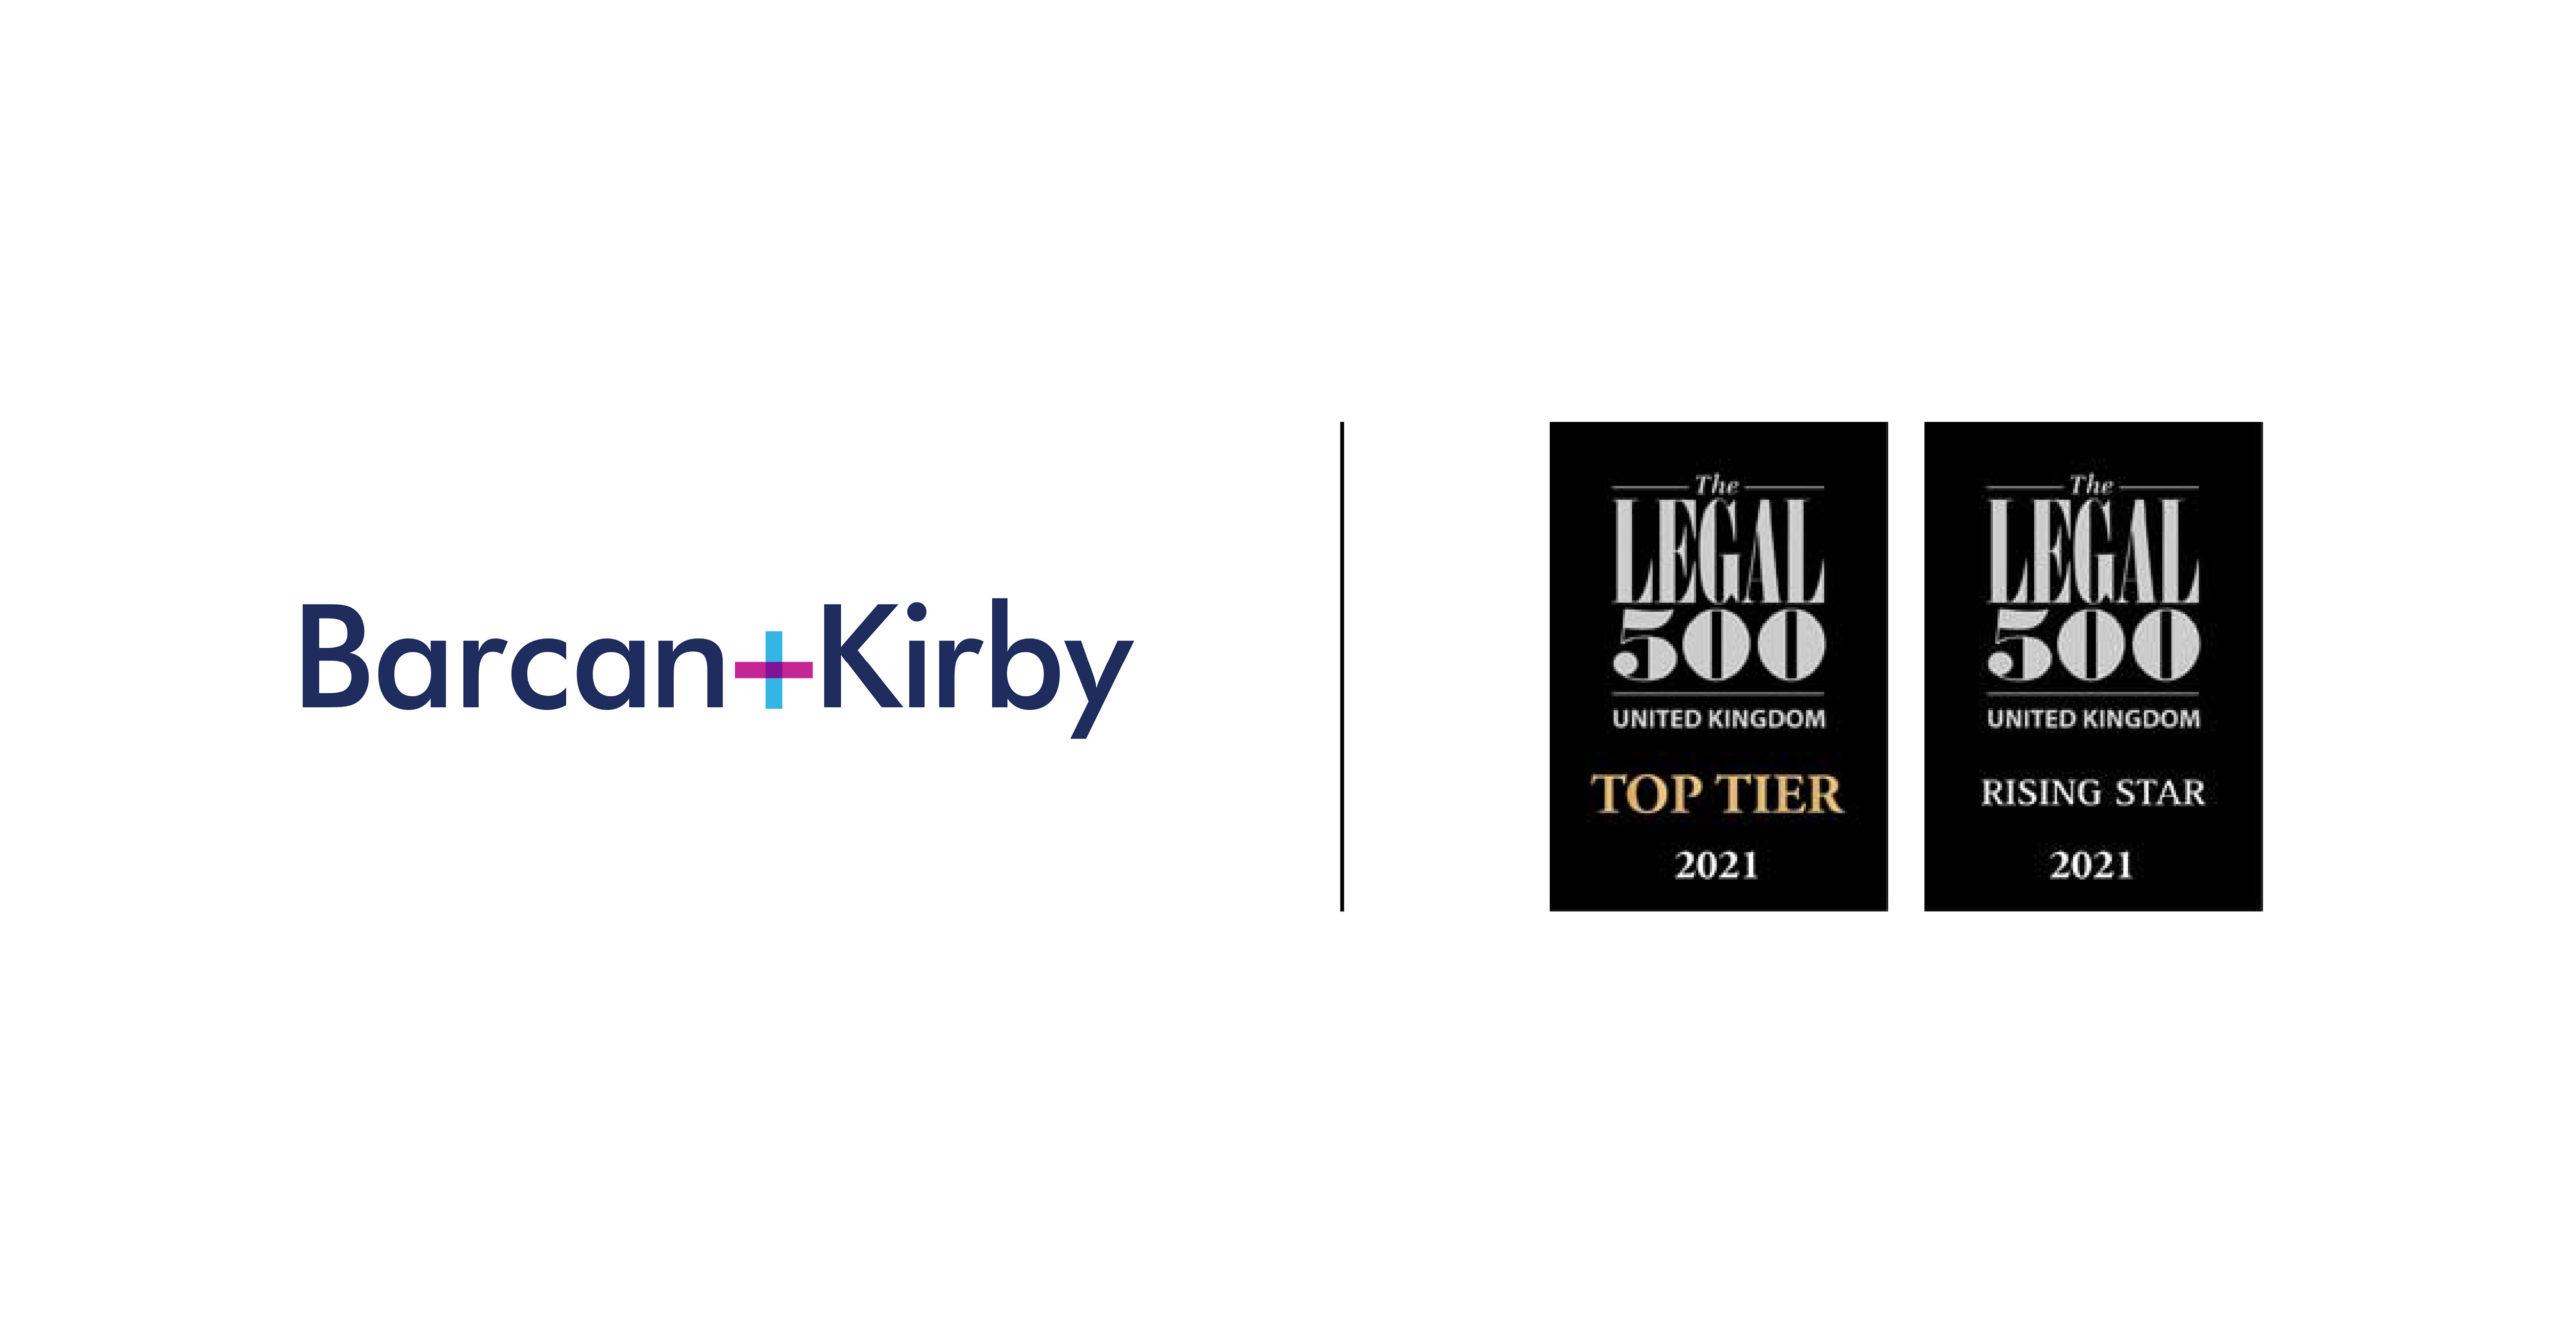 legal-500-logos